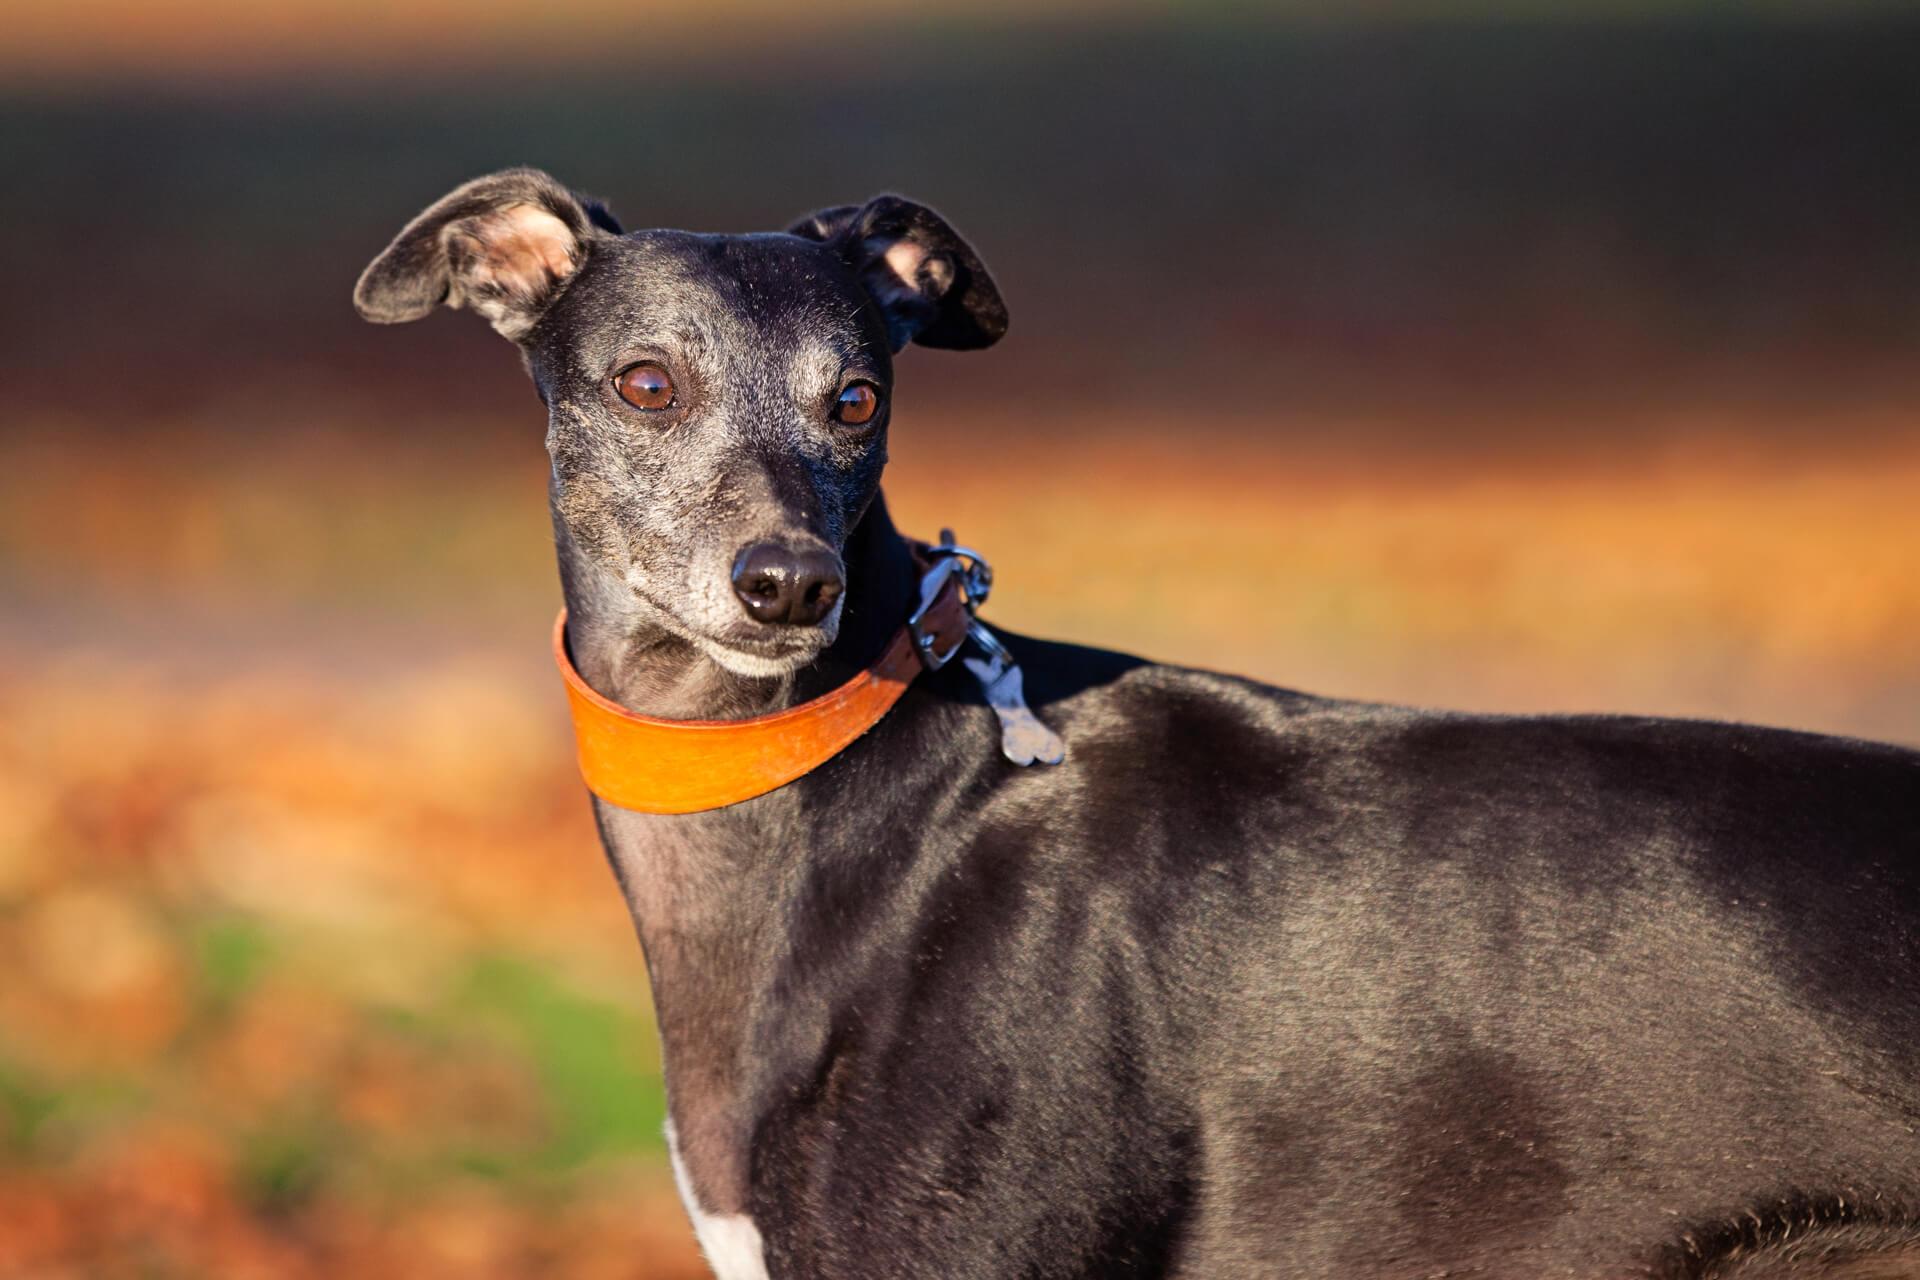 dog with an orange collar